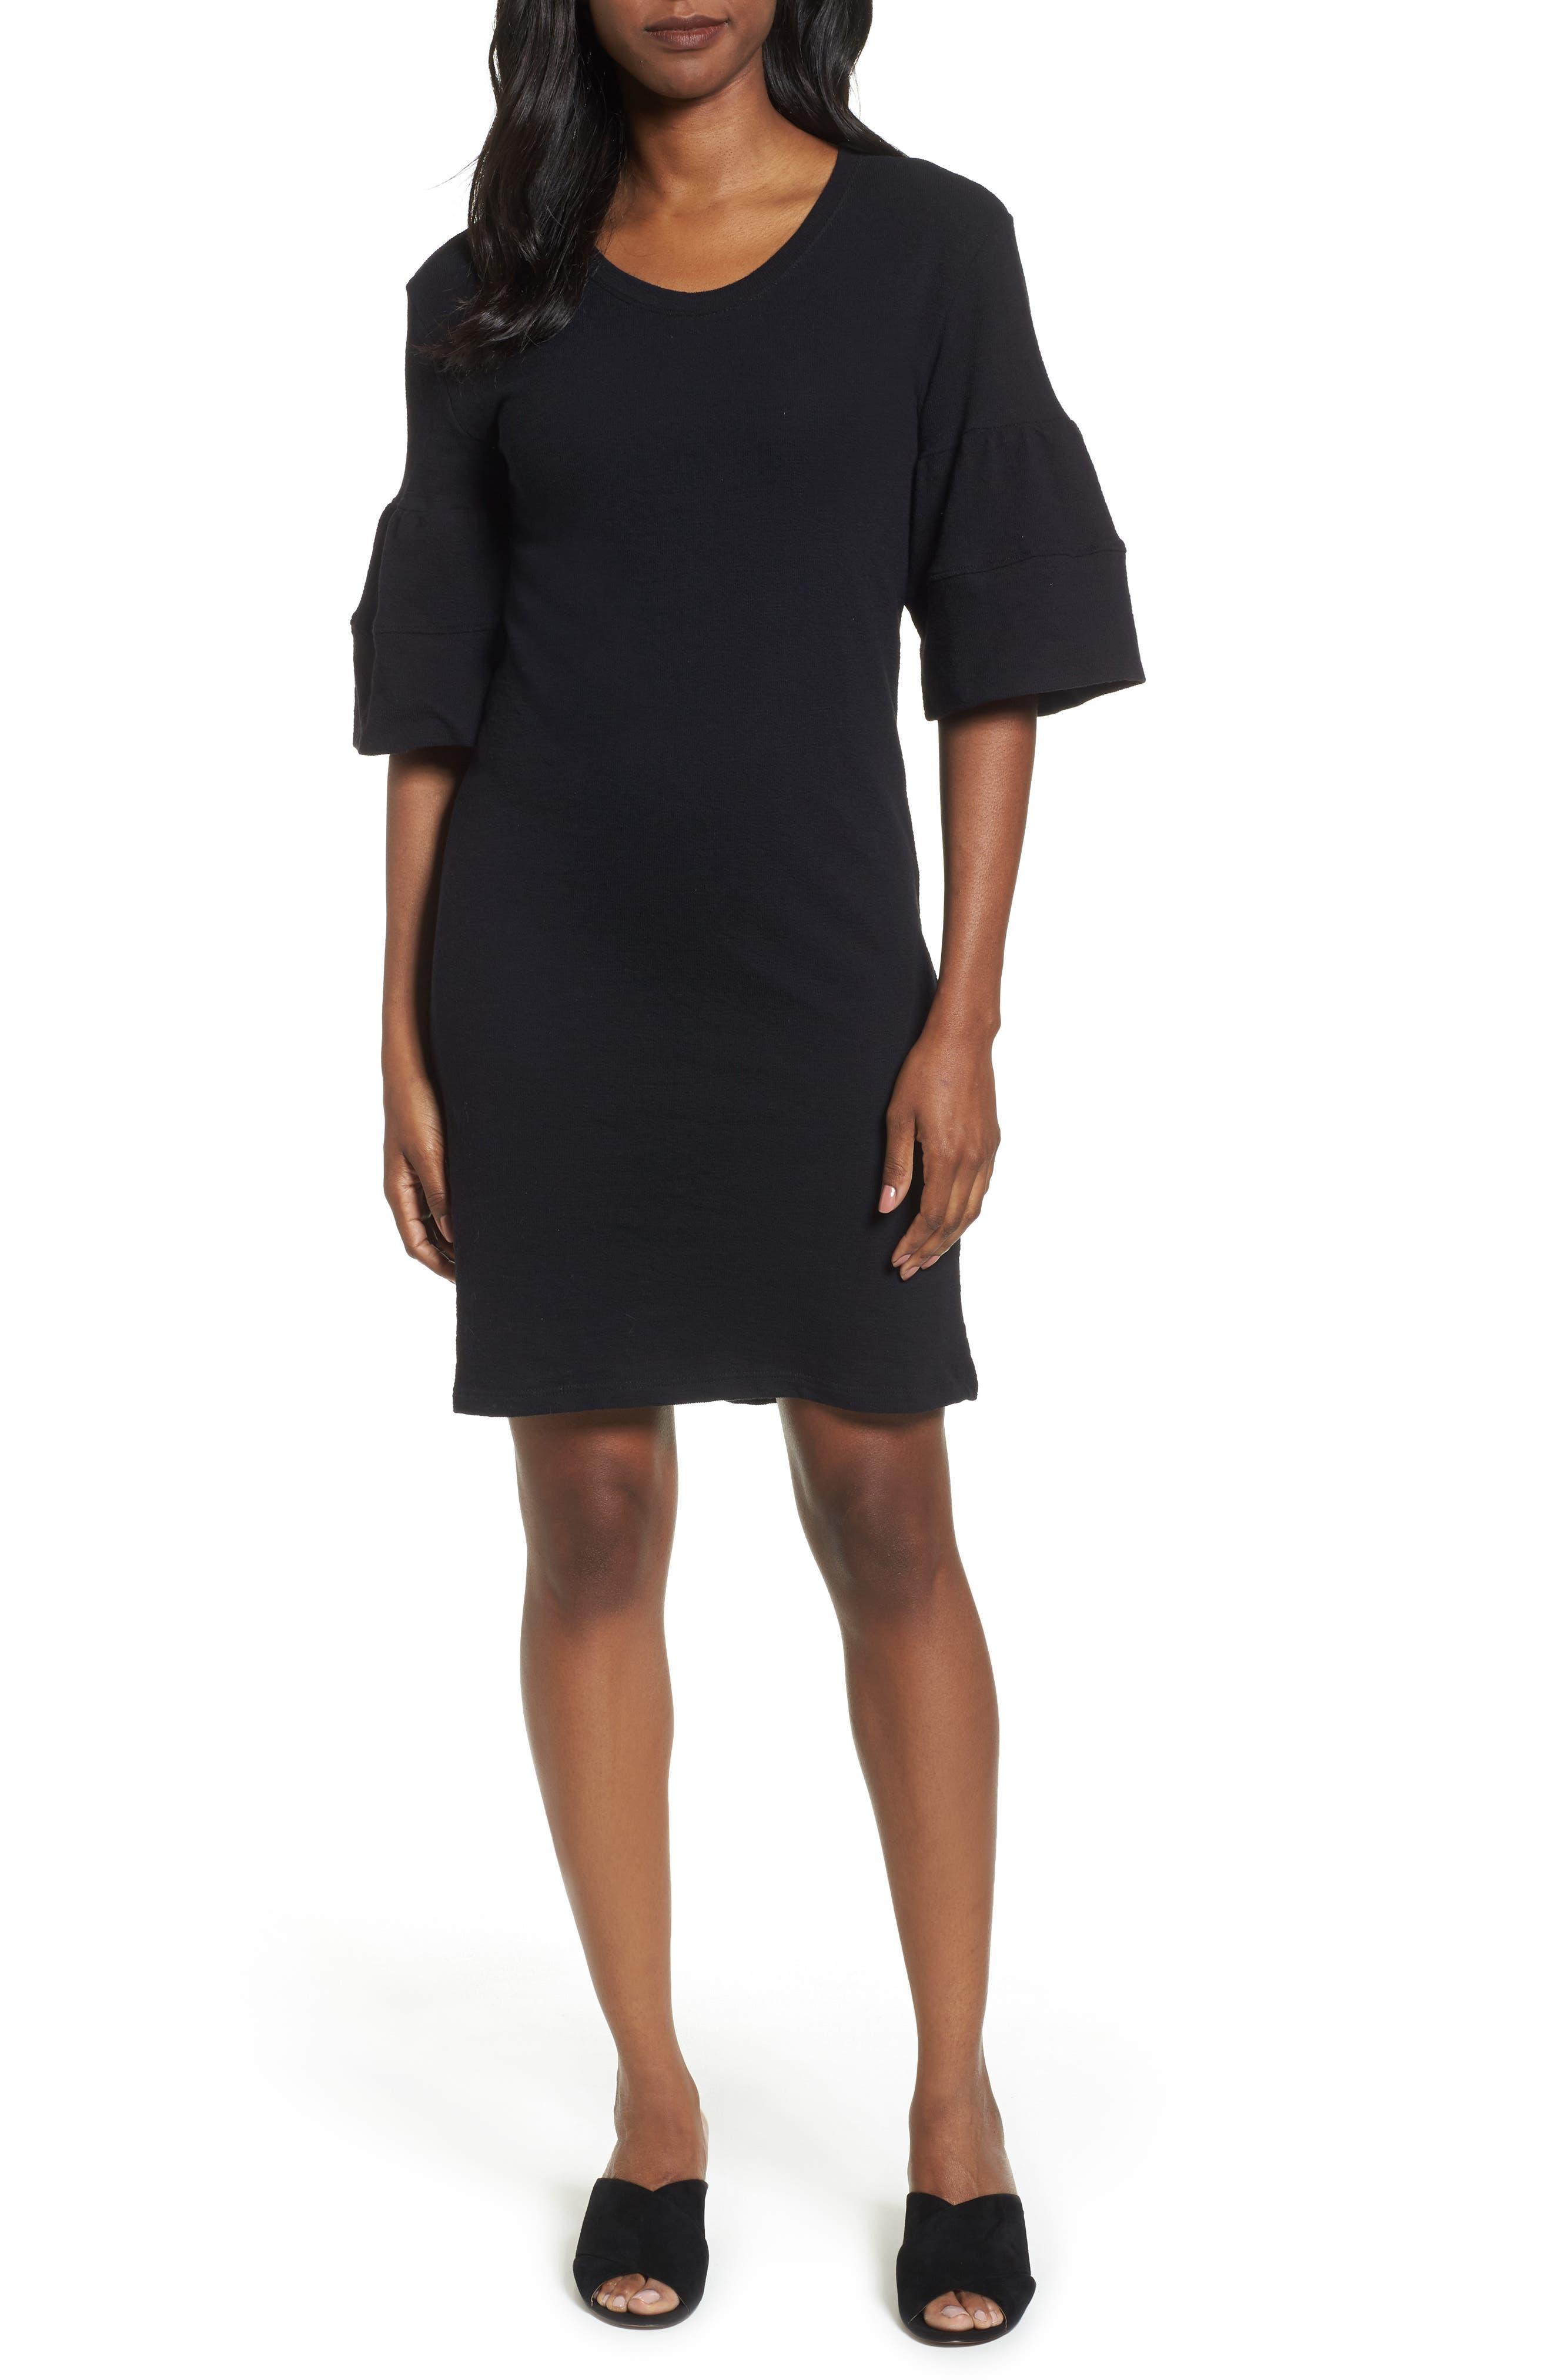 Alternate Image 1 Selected - Caslon® Ruffle Sleeve Knit Dress